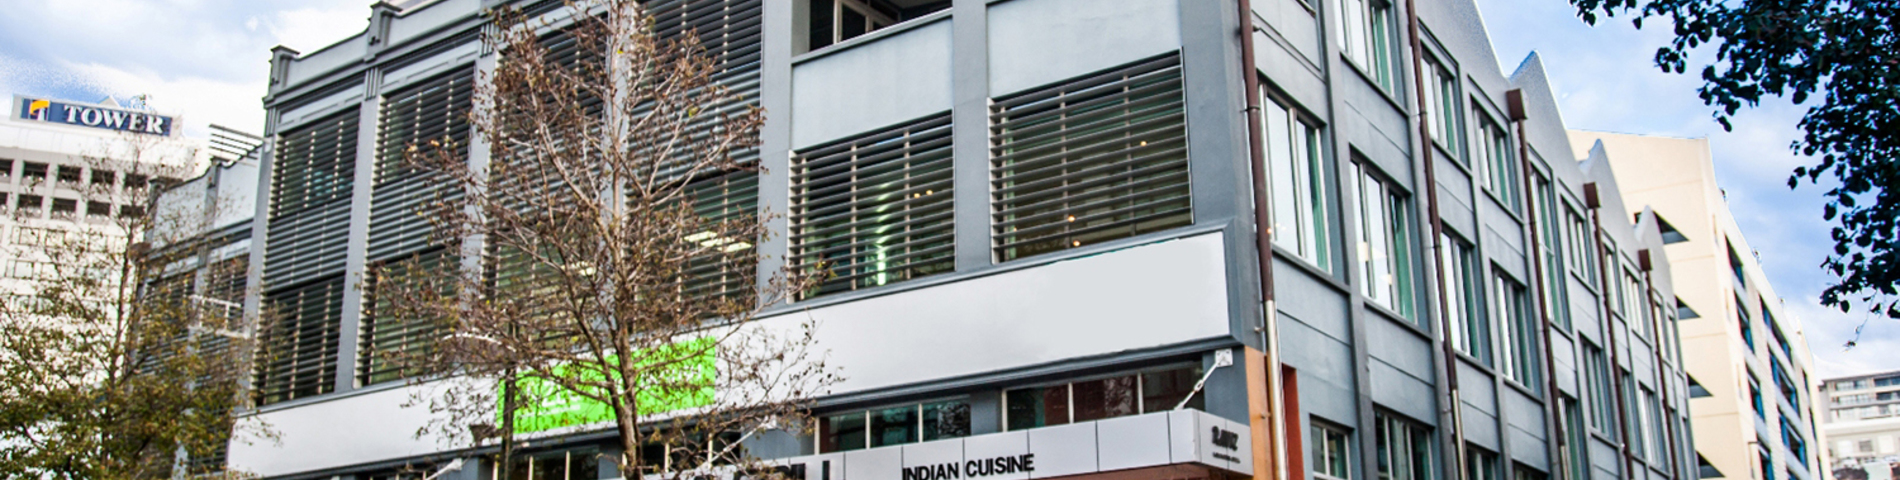 NZLC New Zealand Language Centres bild 1